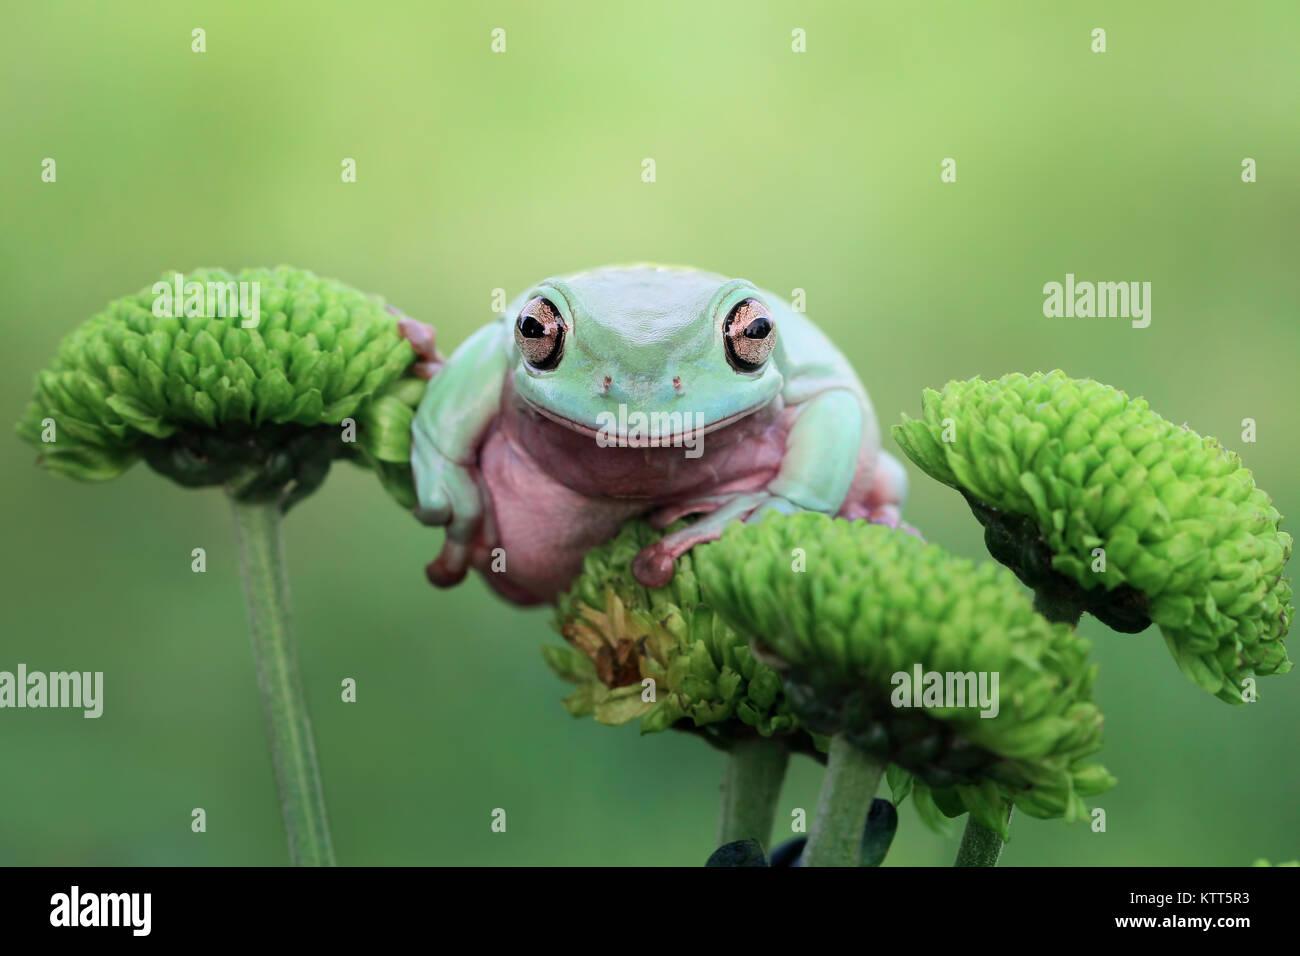 Dumpy tree frog on a flower - Stock Image